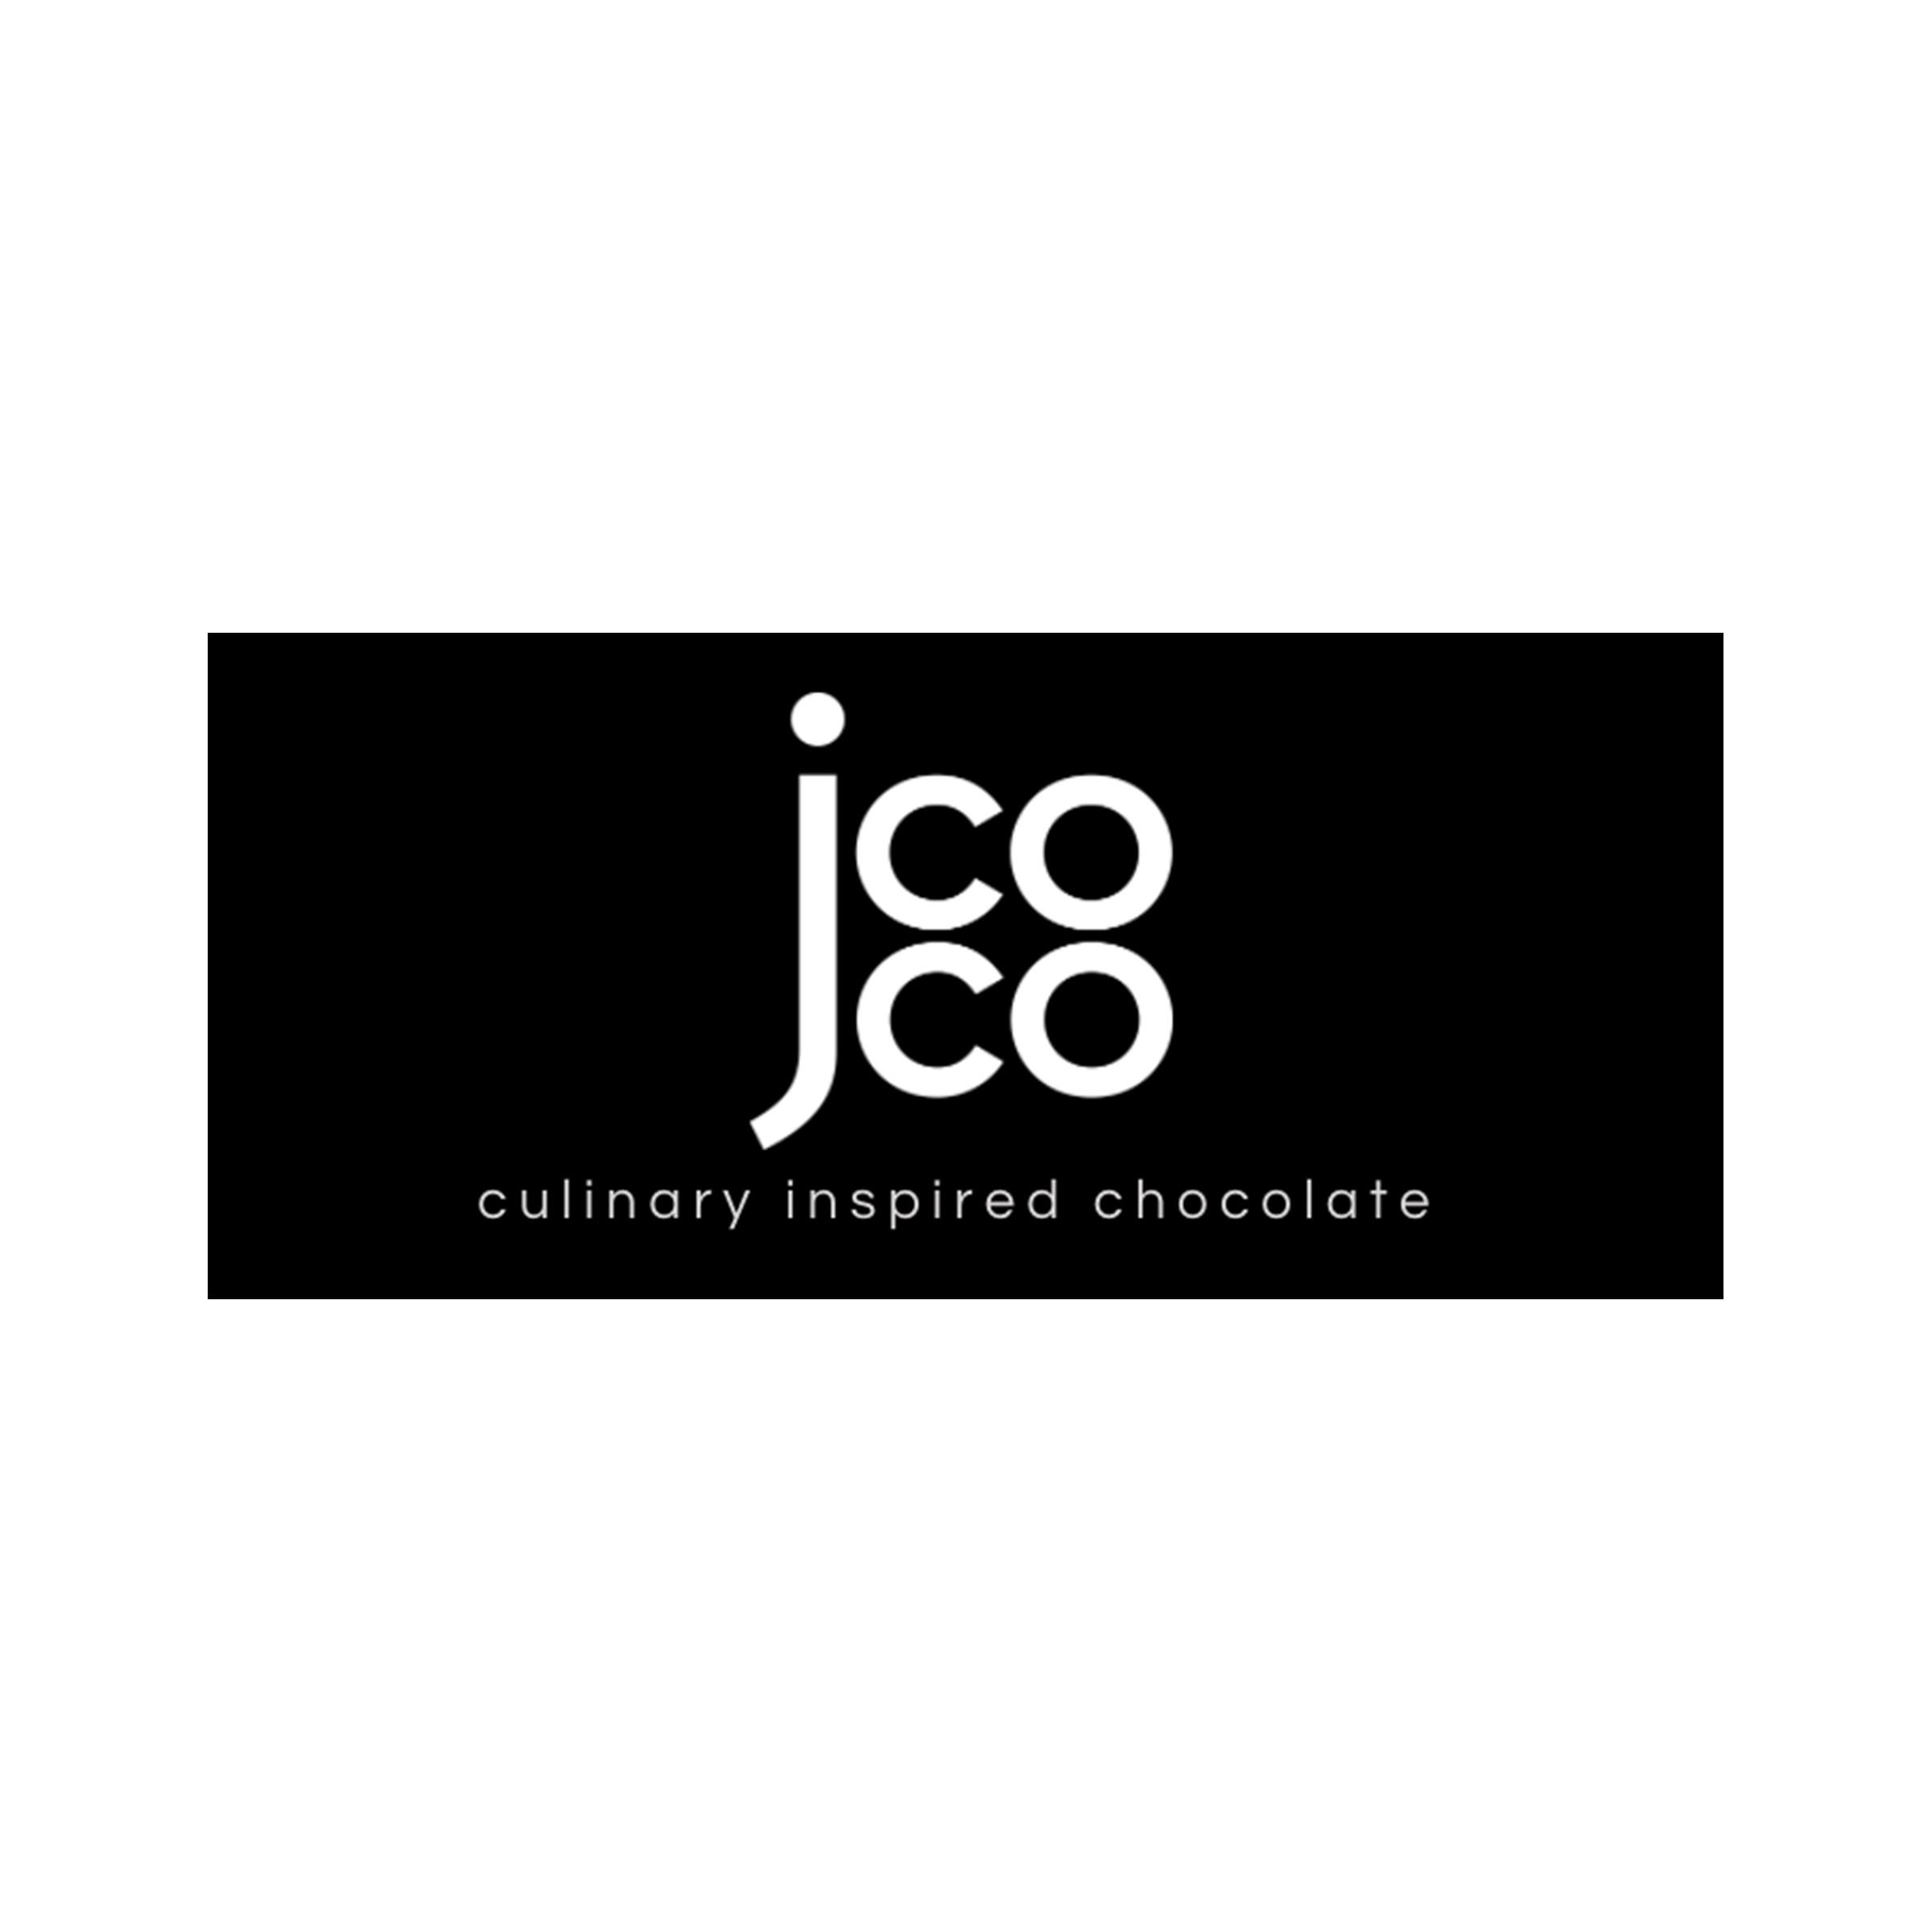 jcoco logo.jpg